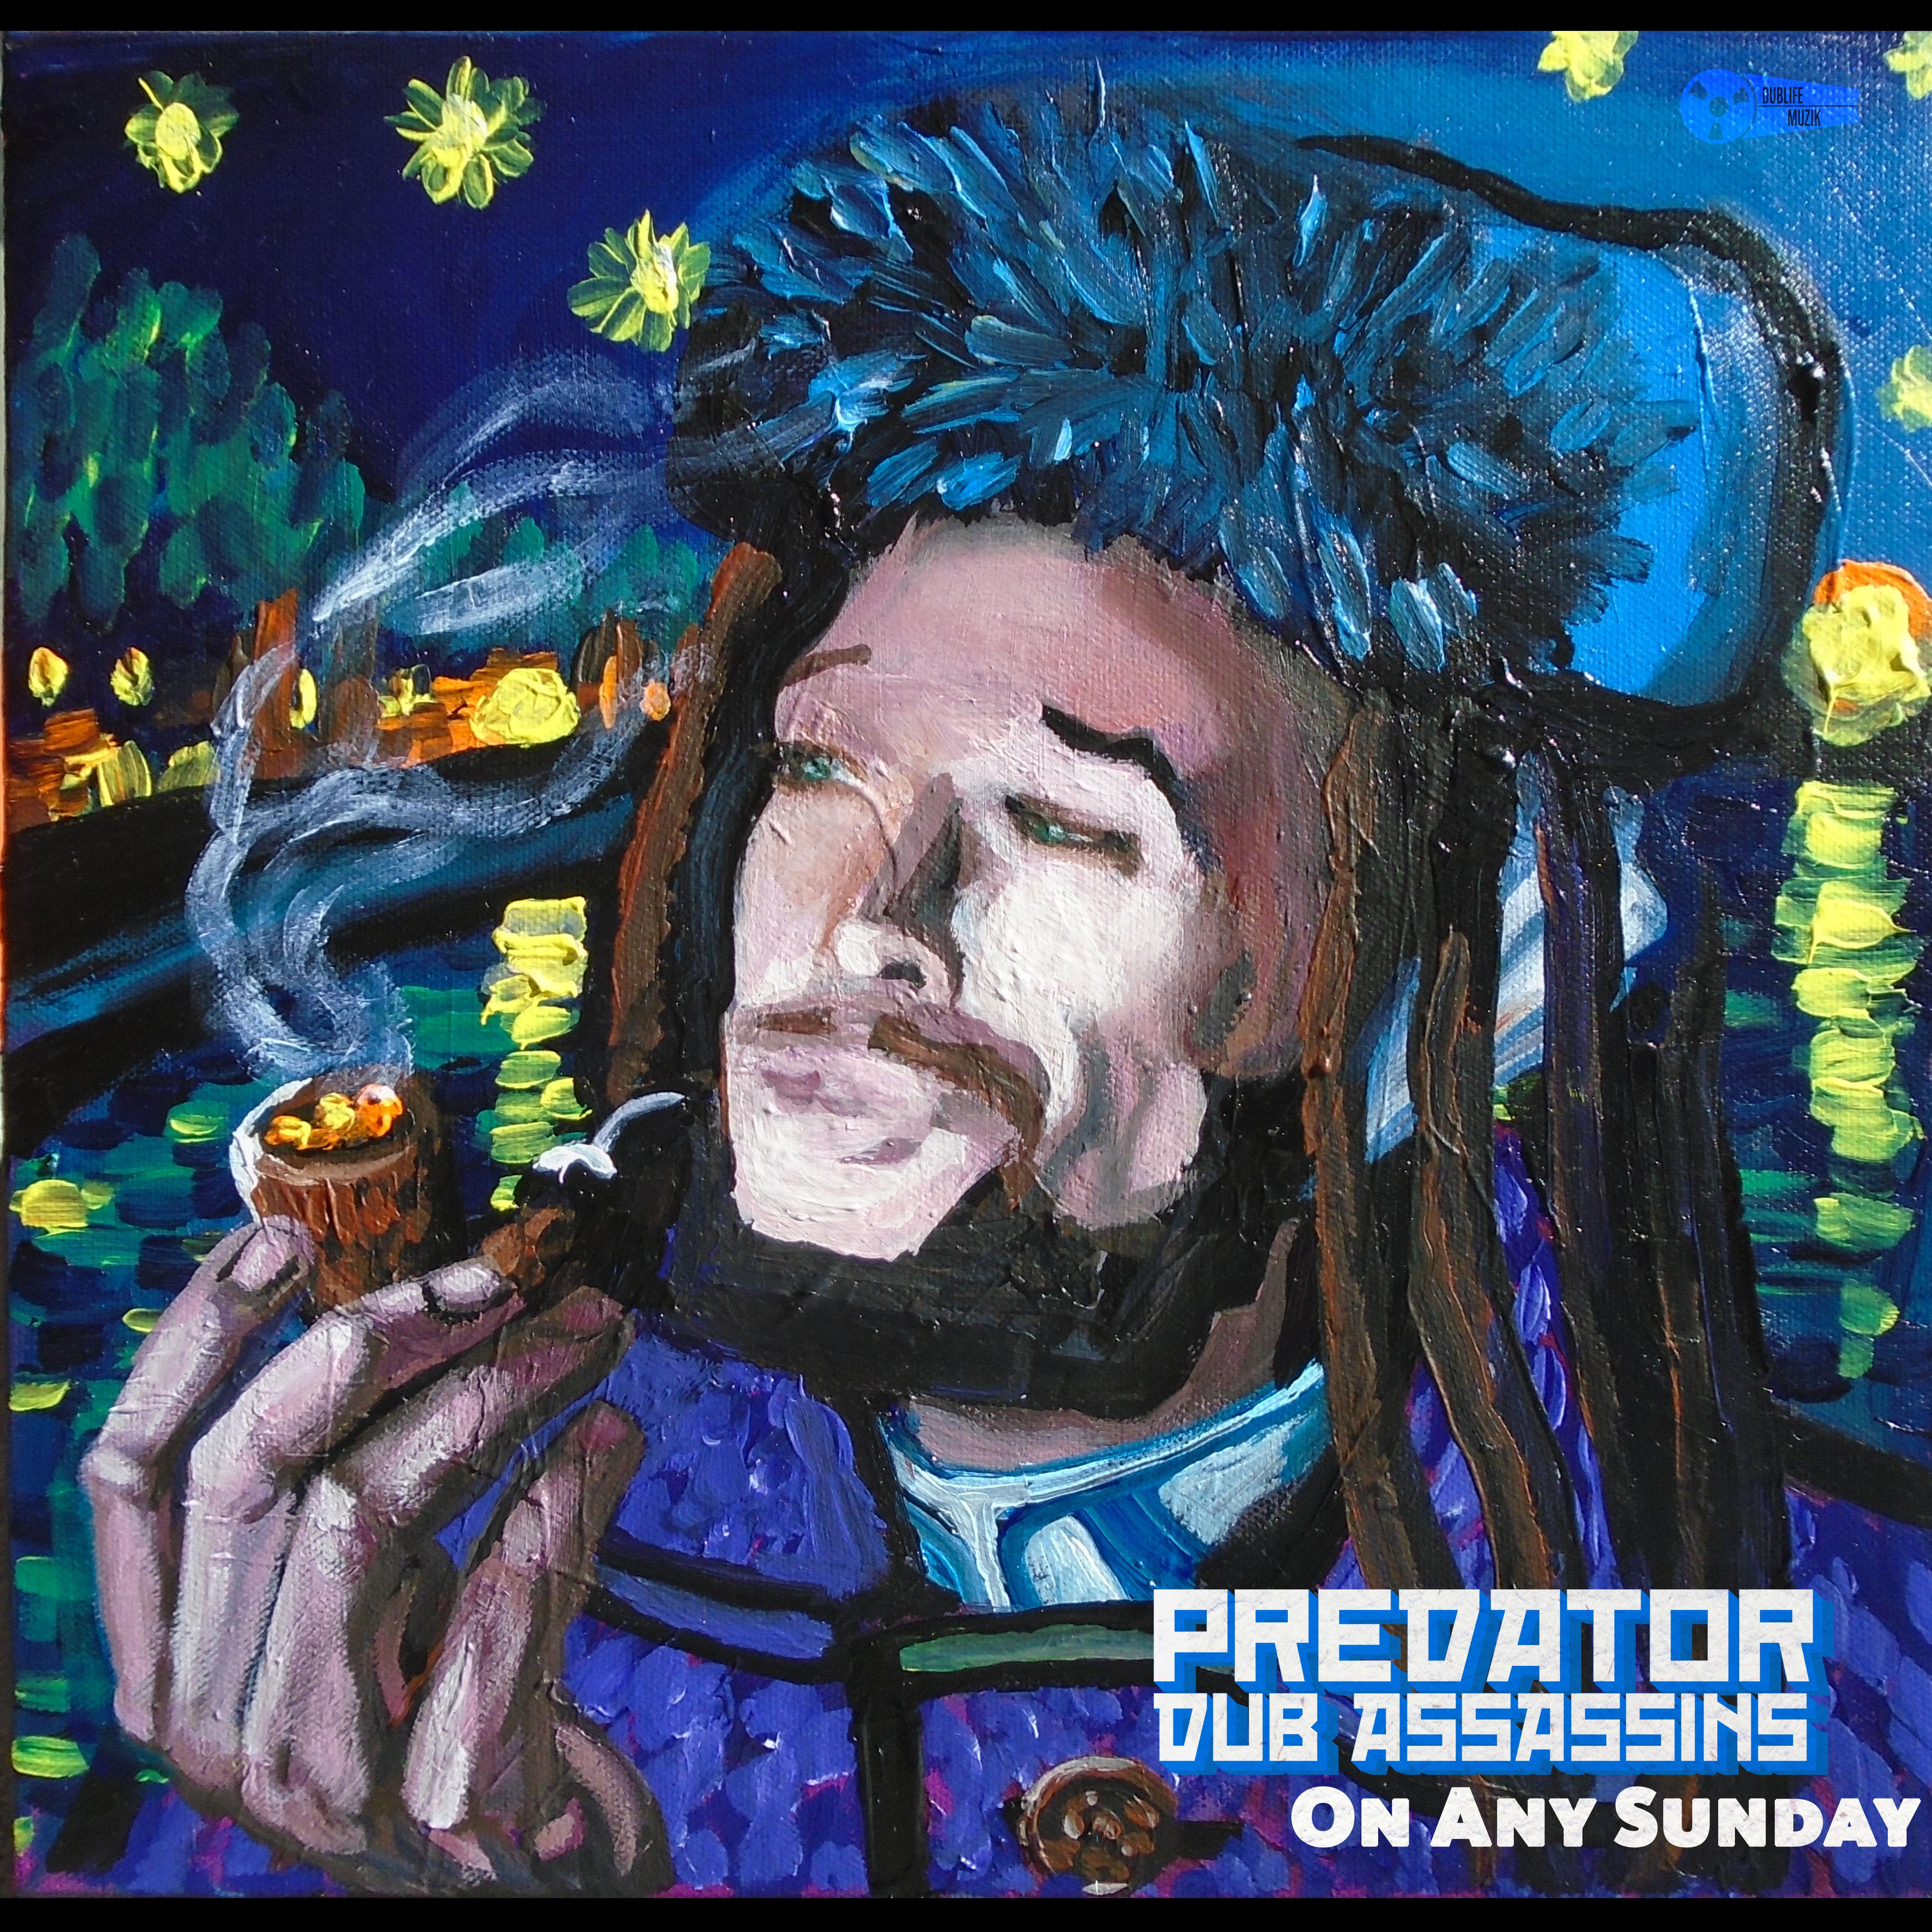 New Predator Dub Assassins album releases 4 20 2019 – Presave it on